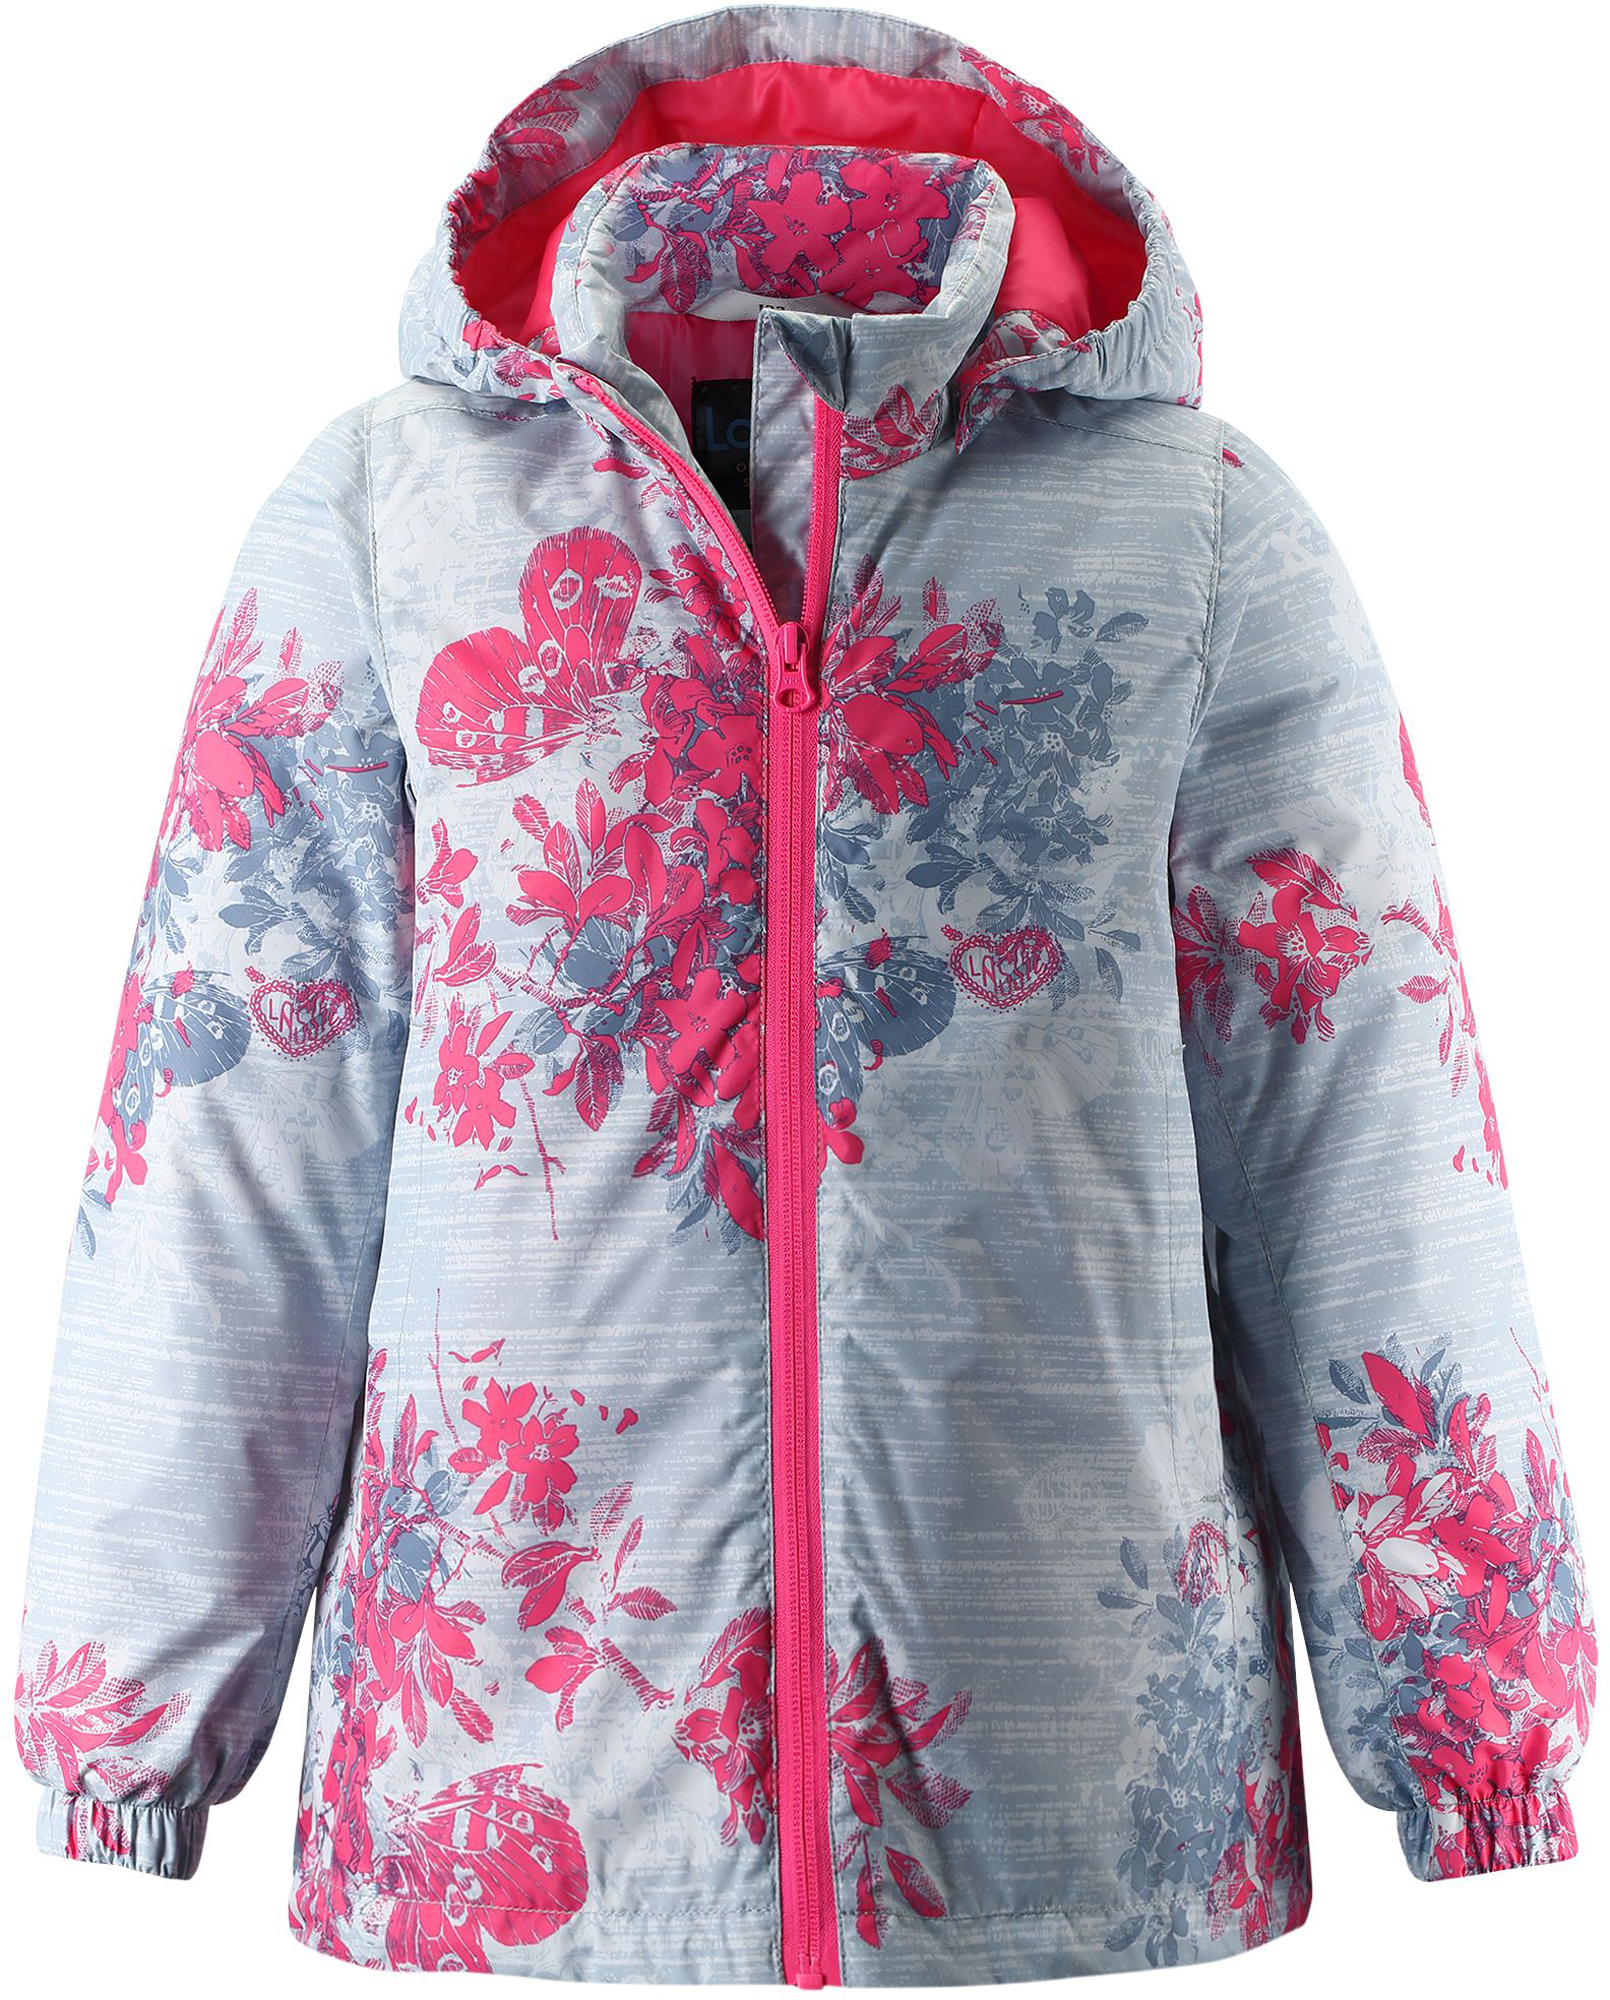 цена на Lassie Куртка утепленная для девочек LASSIE Veela, размер 134